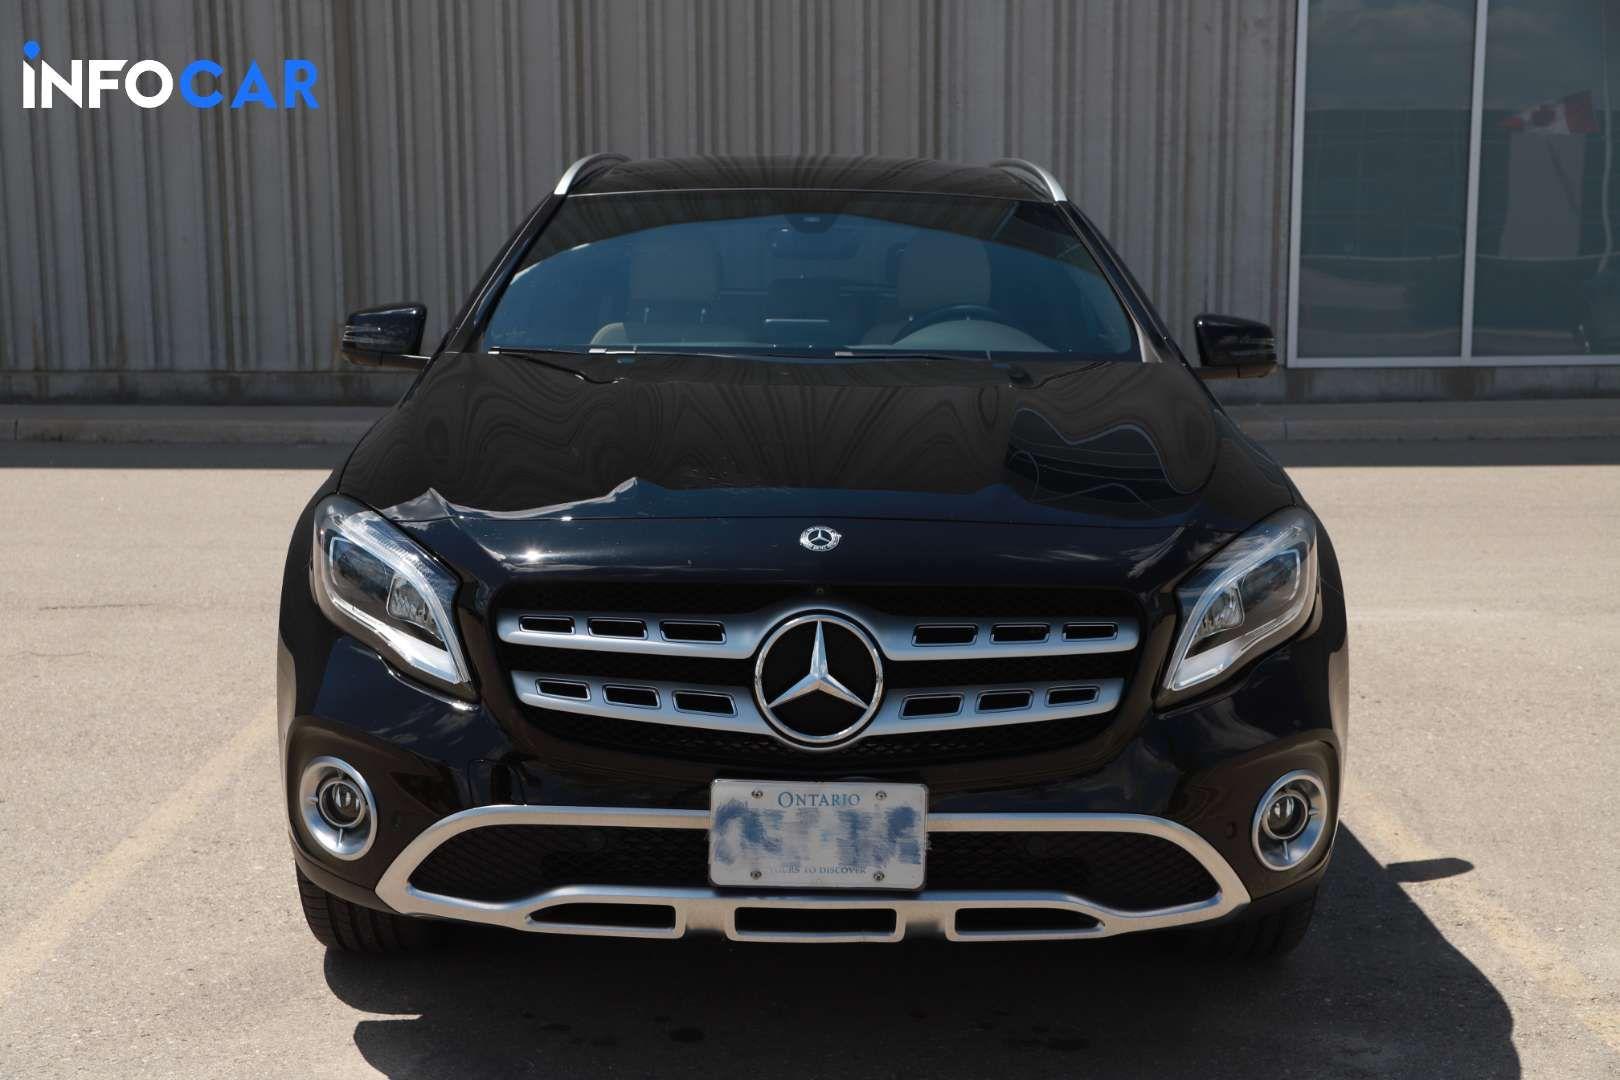 2019 Mercedes-Benz GLA-Class GLA250 - INFOCAR - Toronto's Most Comprehensive New and Used Auto Trading Platform